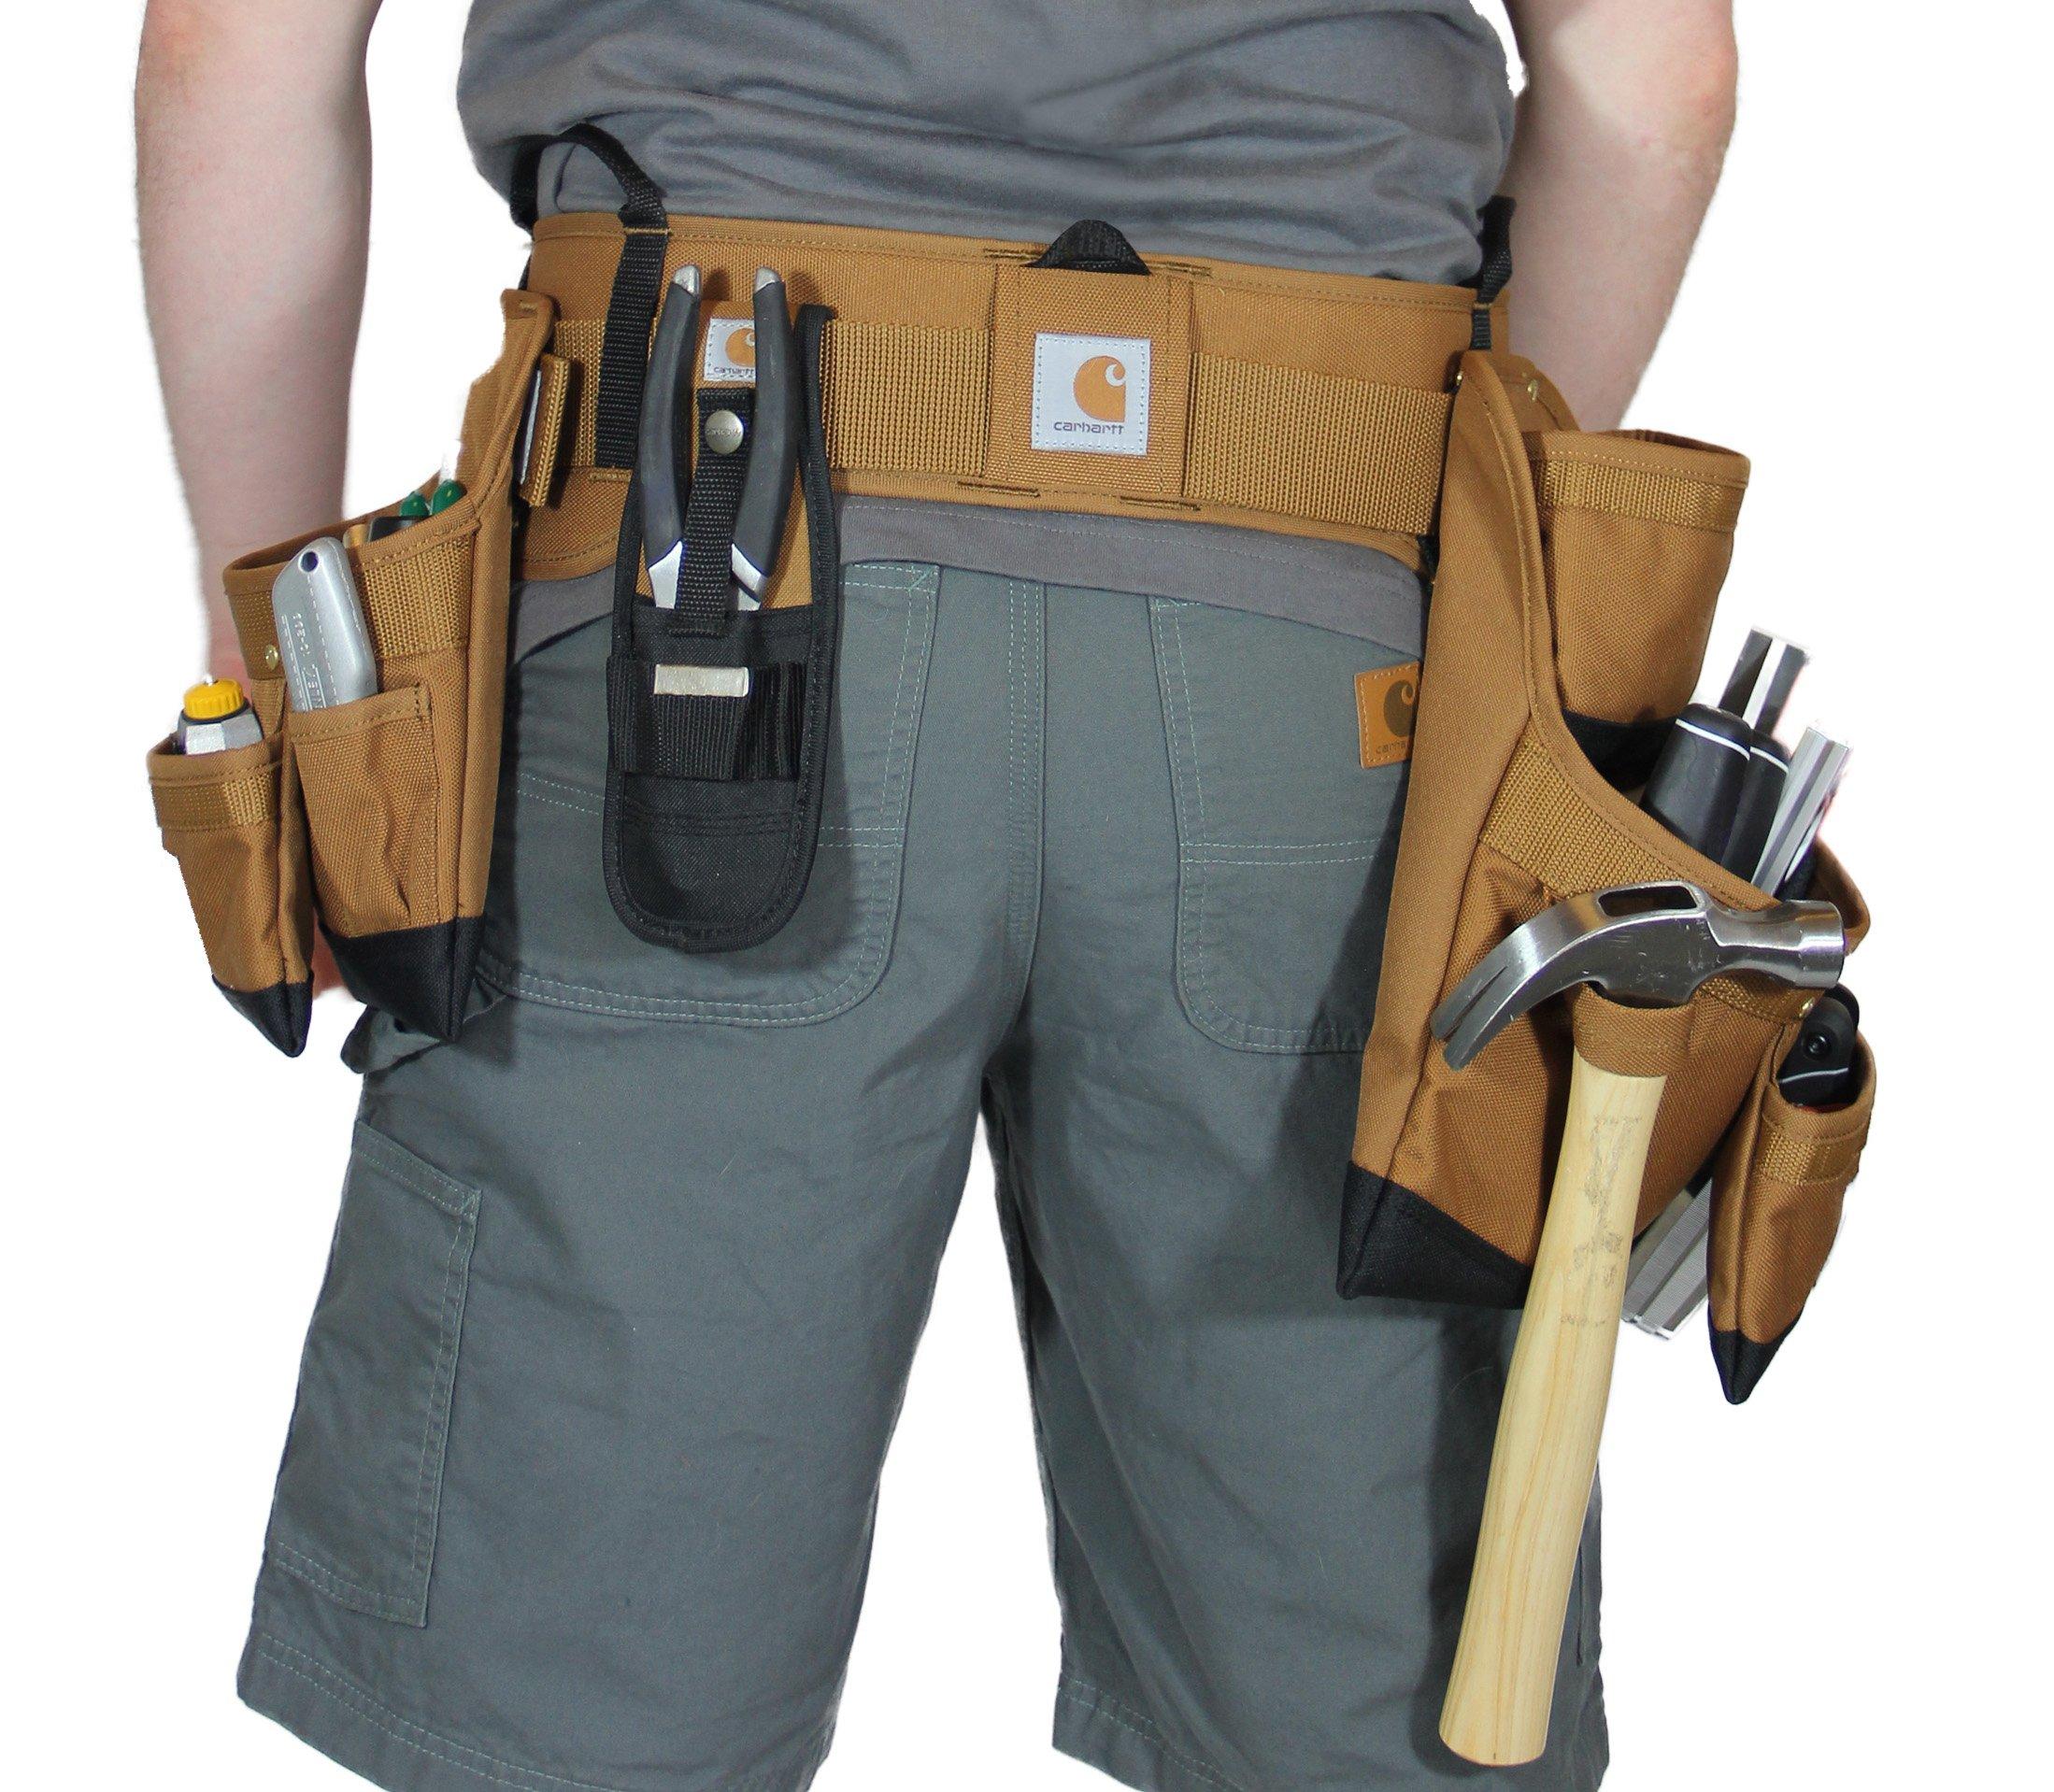 Carhartt Legacy Build Your Own Belt Custom Tool Belt, Padded by Carhartt (Image #4)